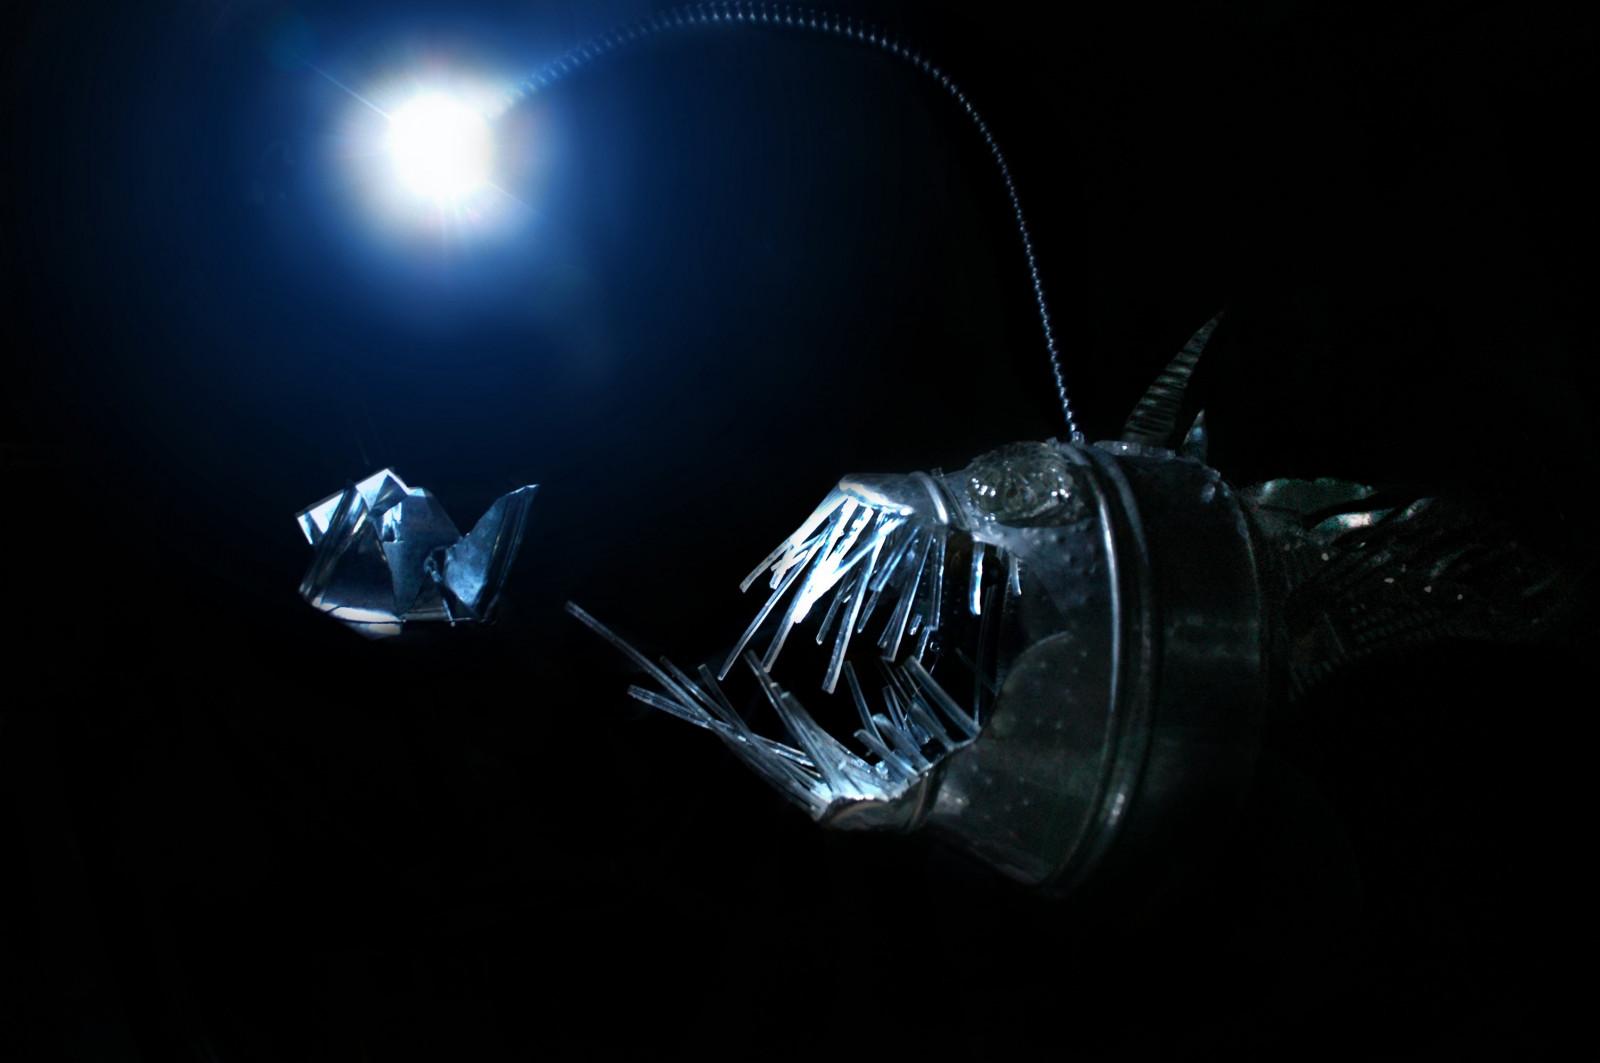 Wallpaper : creature, water, deep sea, Anglerfish, light, darkness ... for Anglerfish Light  155fiz